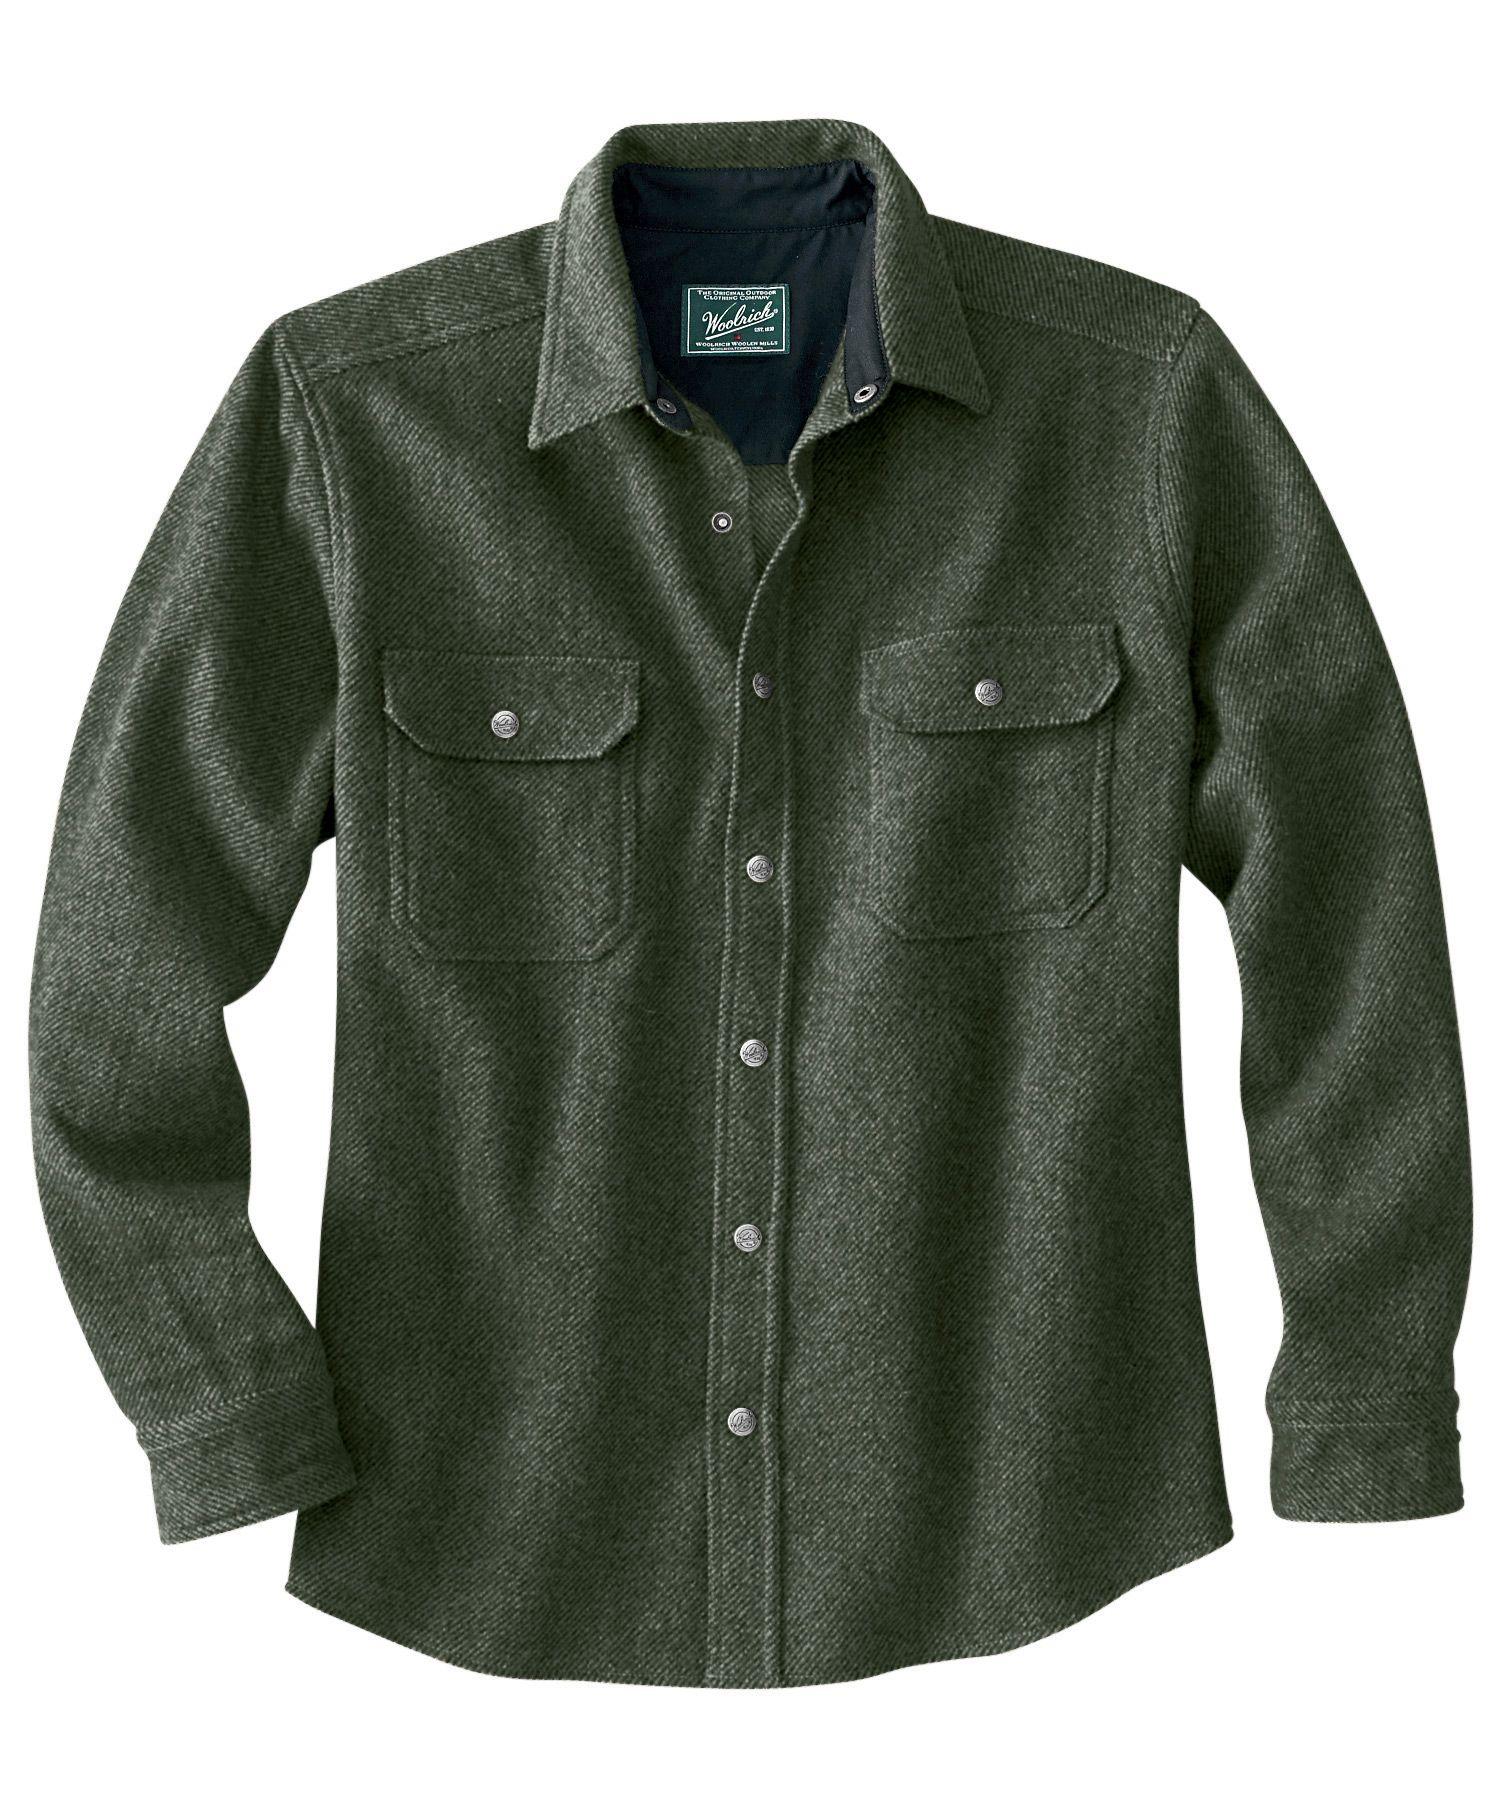 2b509685 Men's Wool Alaskan Shirt - Woolrich $119 | Patrick in 2019 | Shirts ...